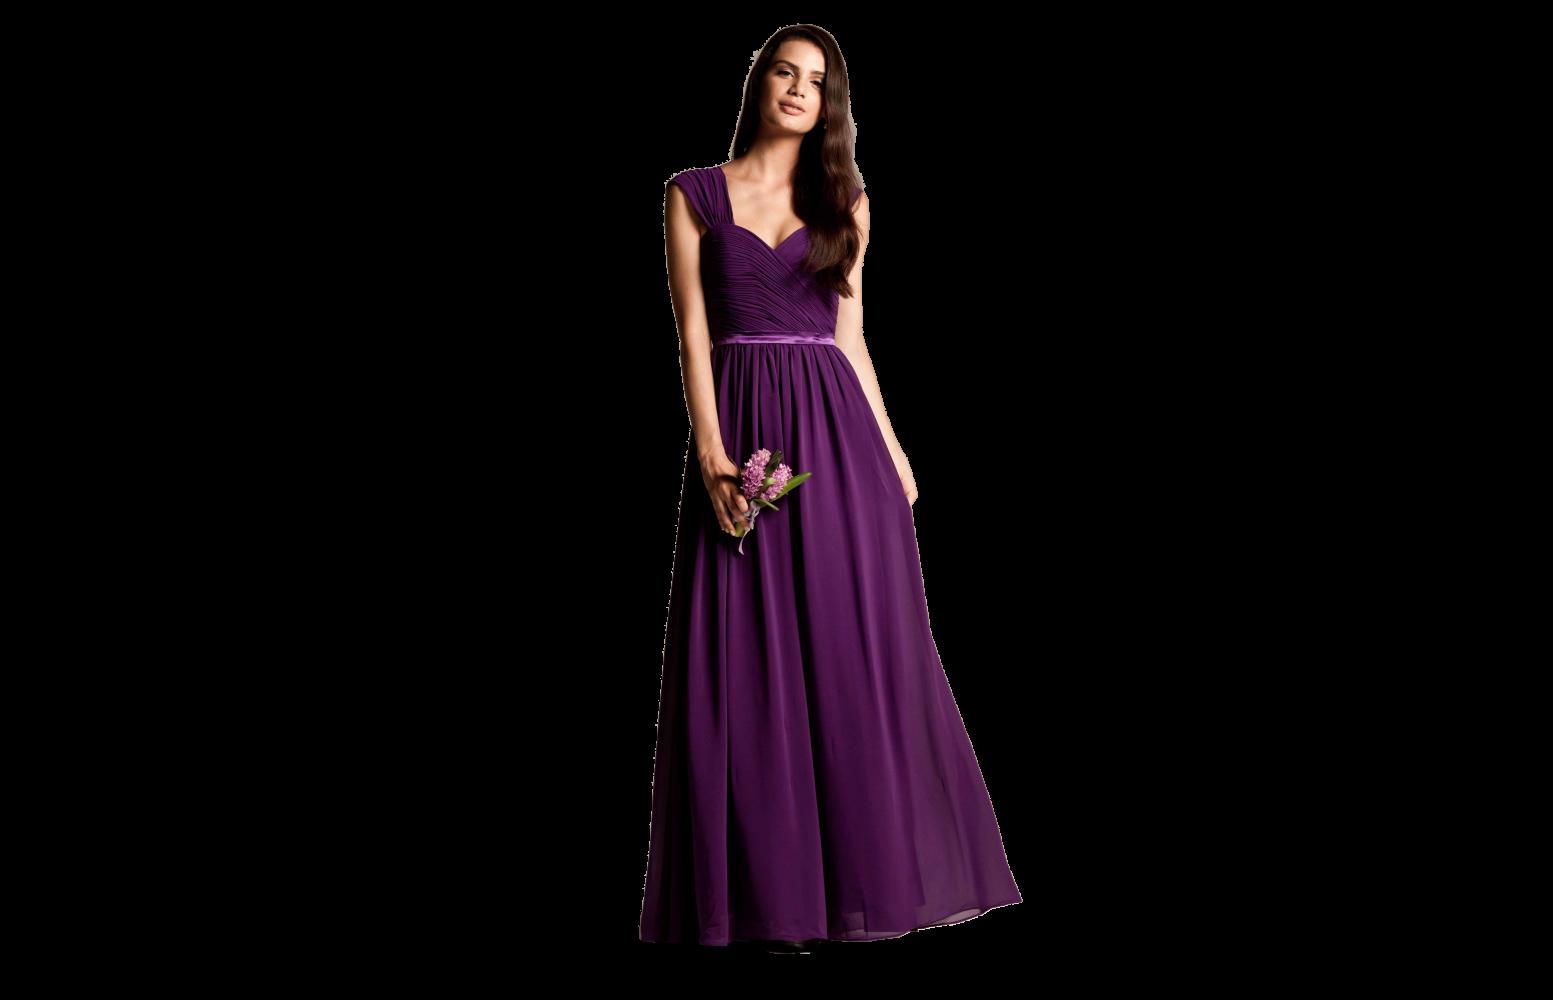 Elegant plum bridesmaid dresses plum bridesmaid dresses online natasha millani plum bridesmaid dresses with sleeves online ombrellifo Choice Image